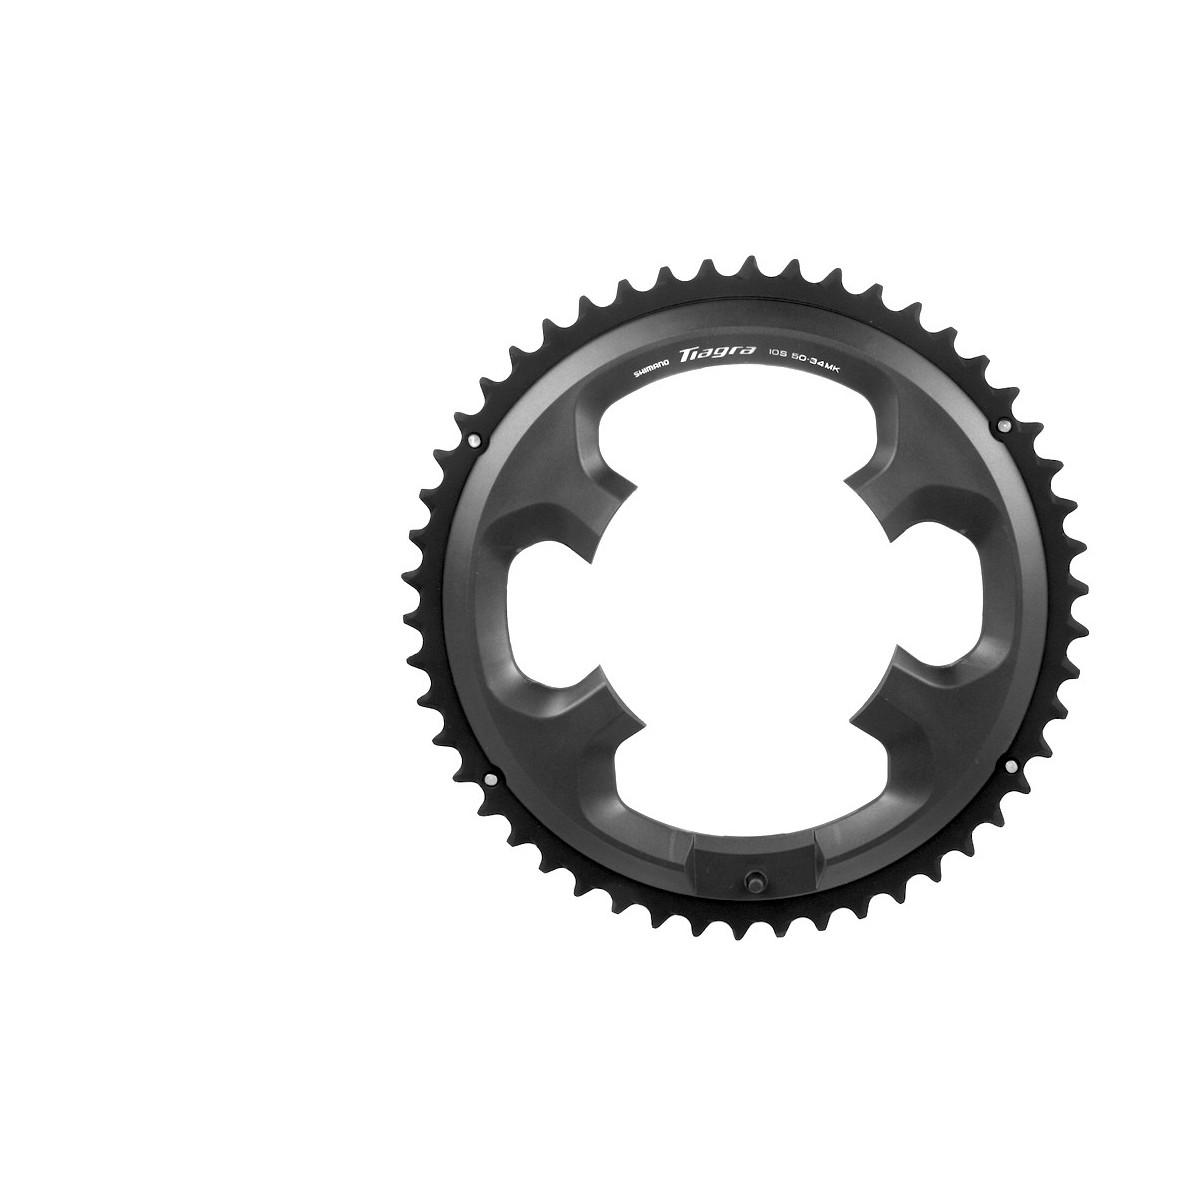 Road bike's front chainring Shimano Tiagra FC-4700 50T-MK black